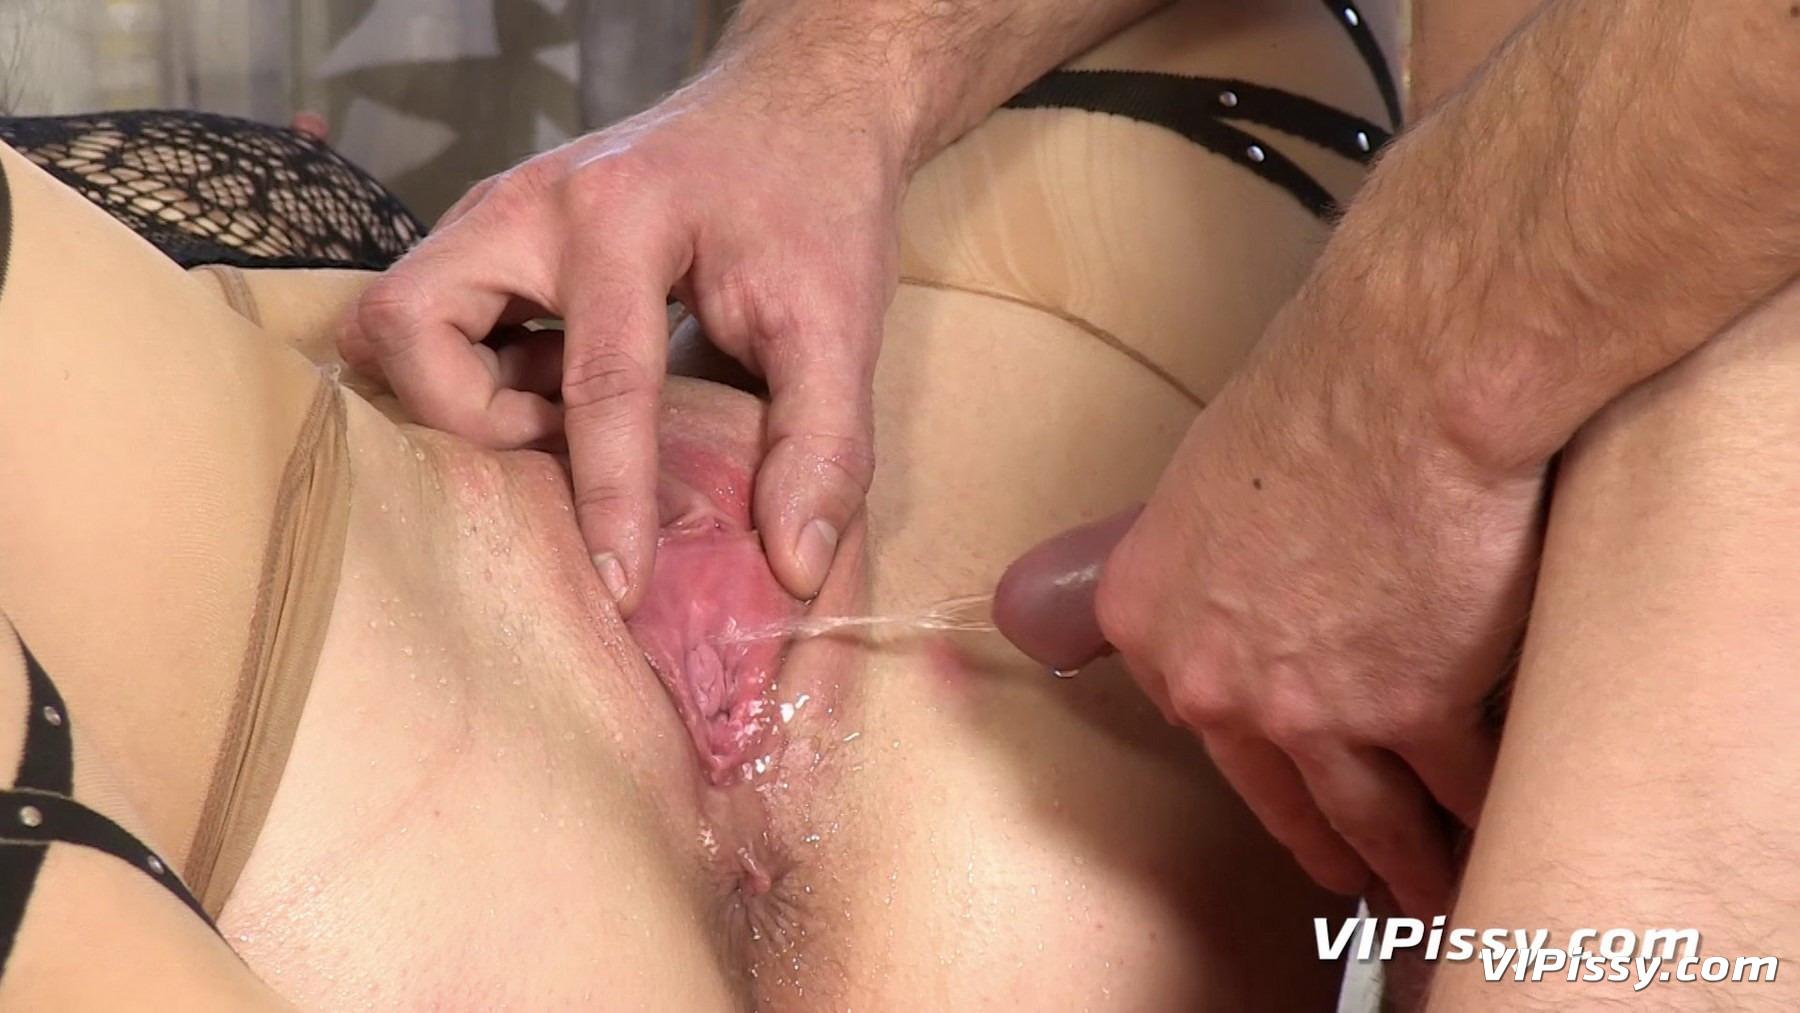 muzhchina-pisaet-na-klitor-porno-video